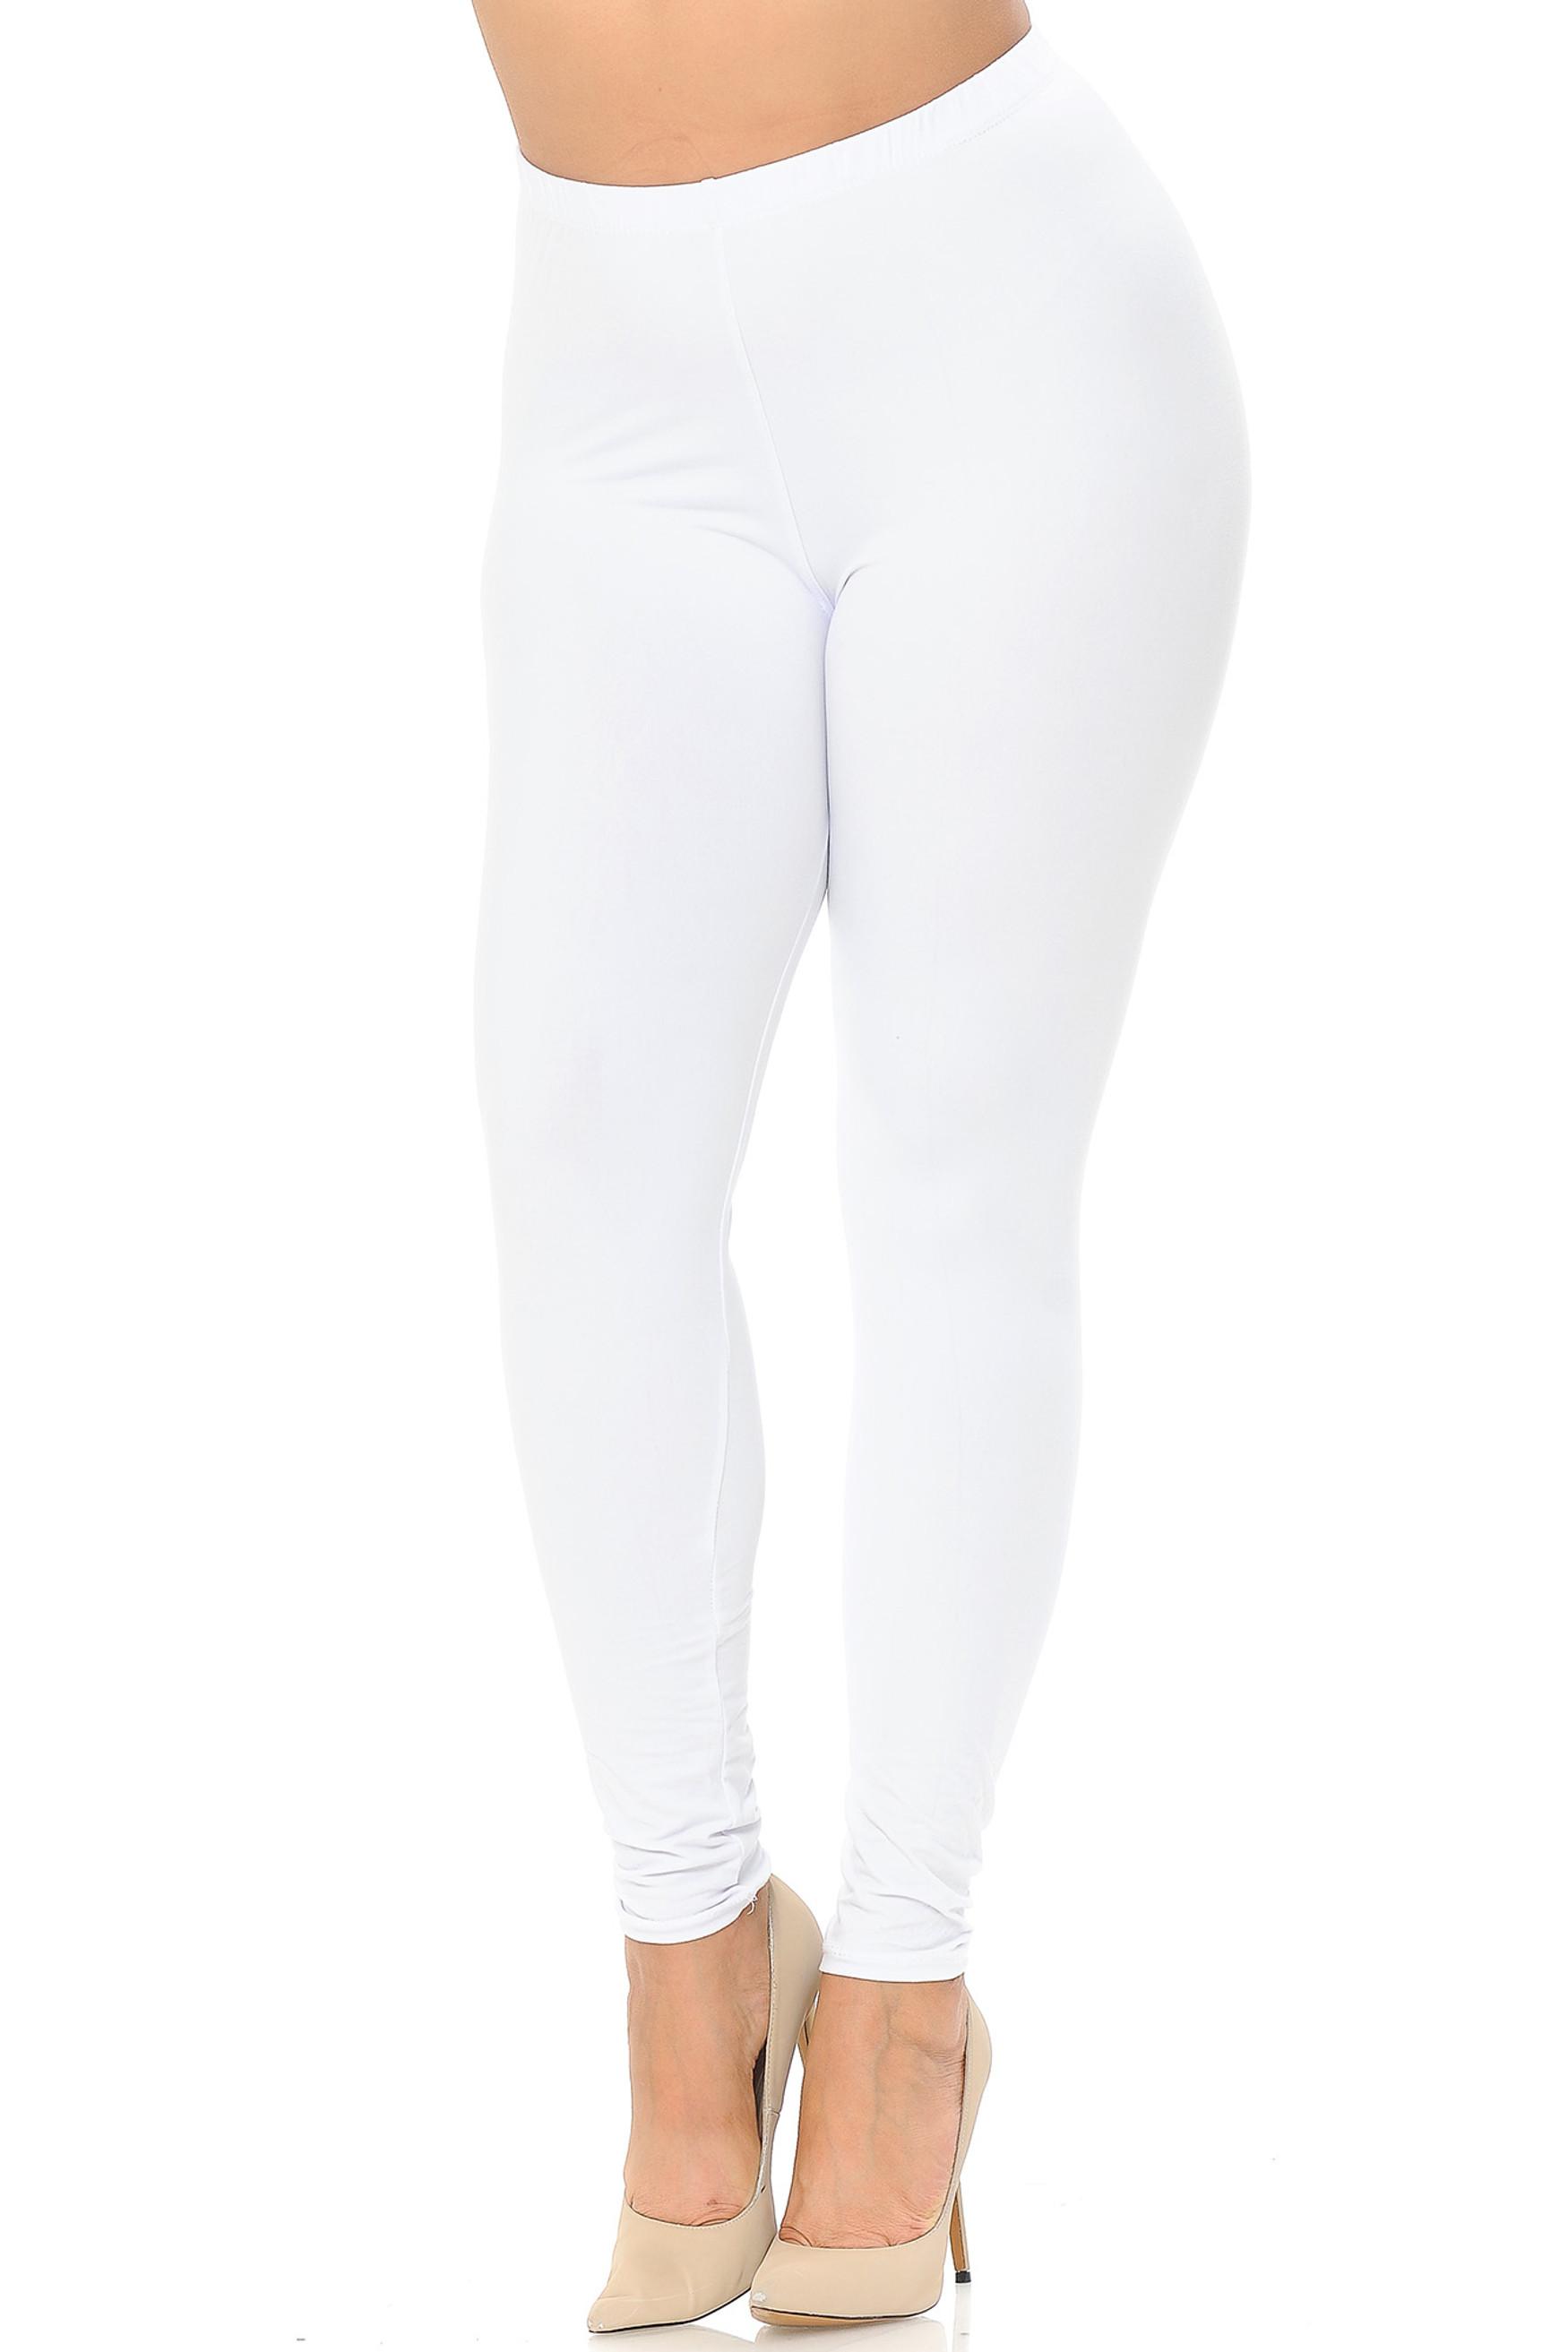 White Main Brushed Basic Solid Plus Size Leggings - EEVEE